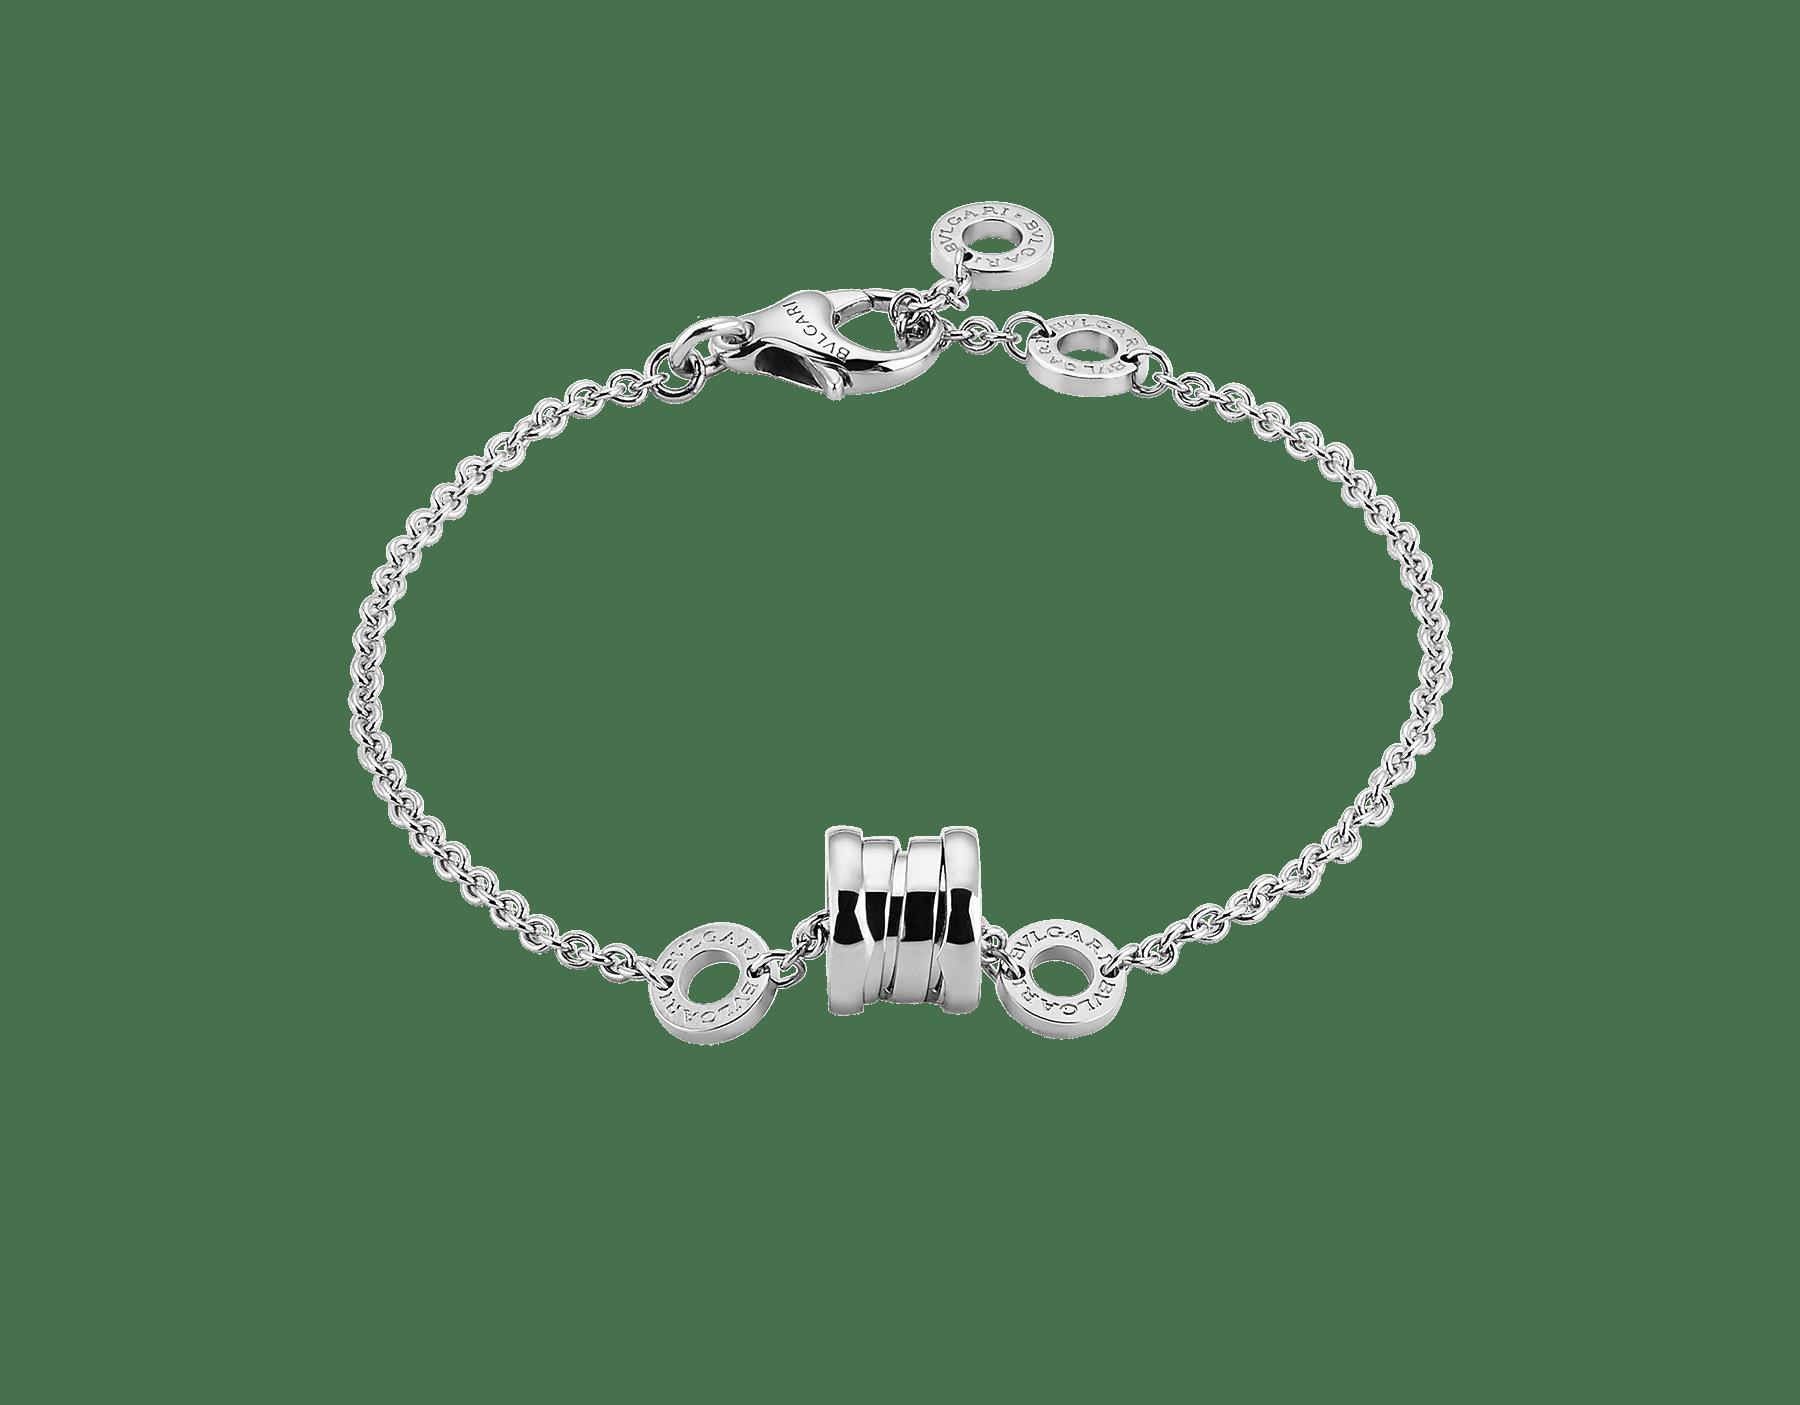 Pulsera flexible B.zero1 en oro blanco de 18 qt. BR853720 image 1